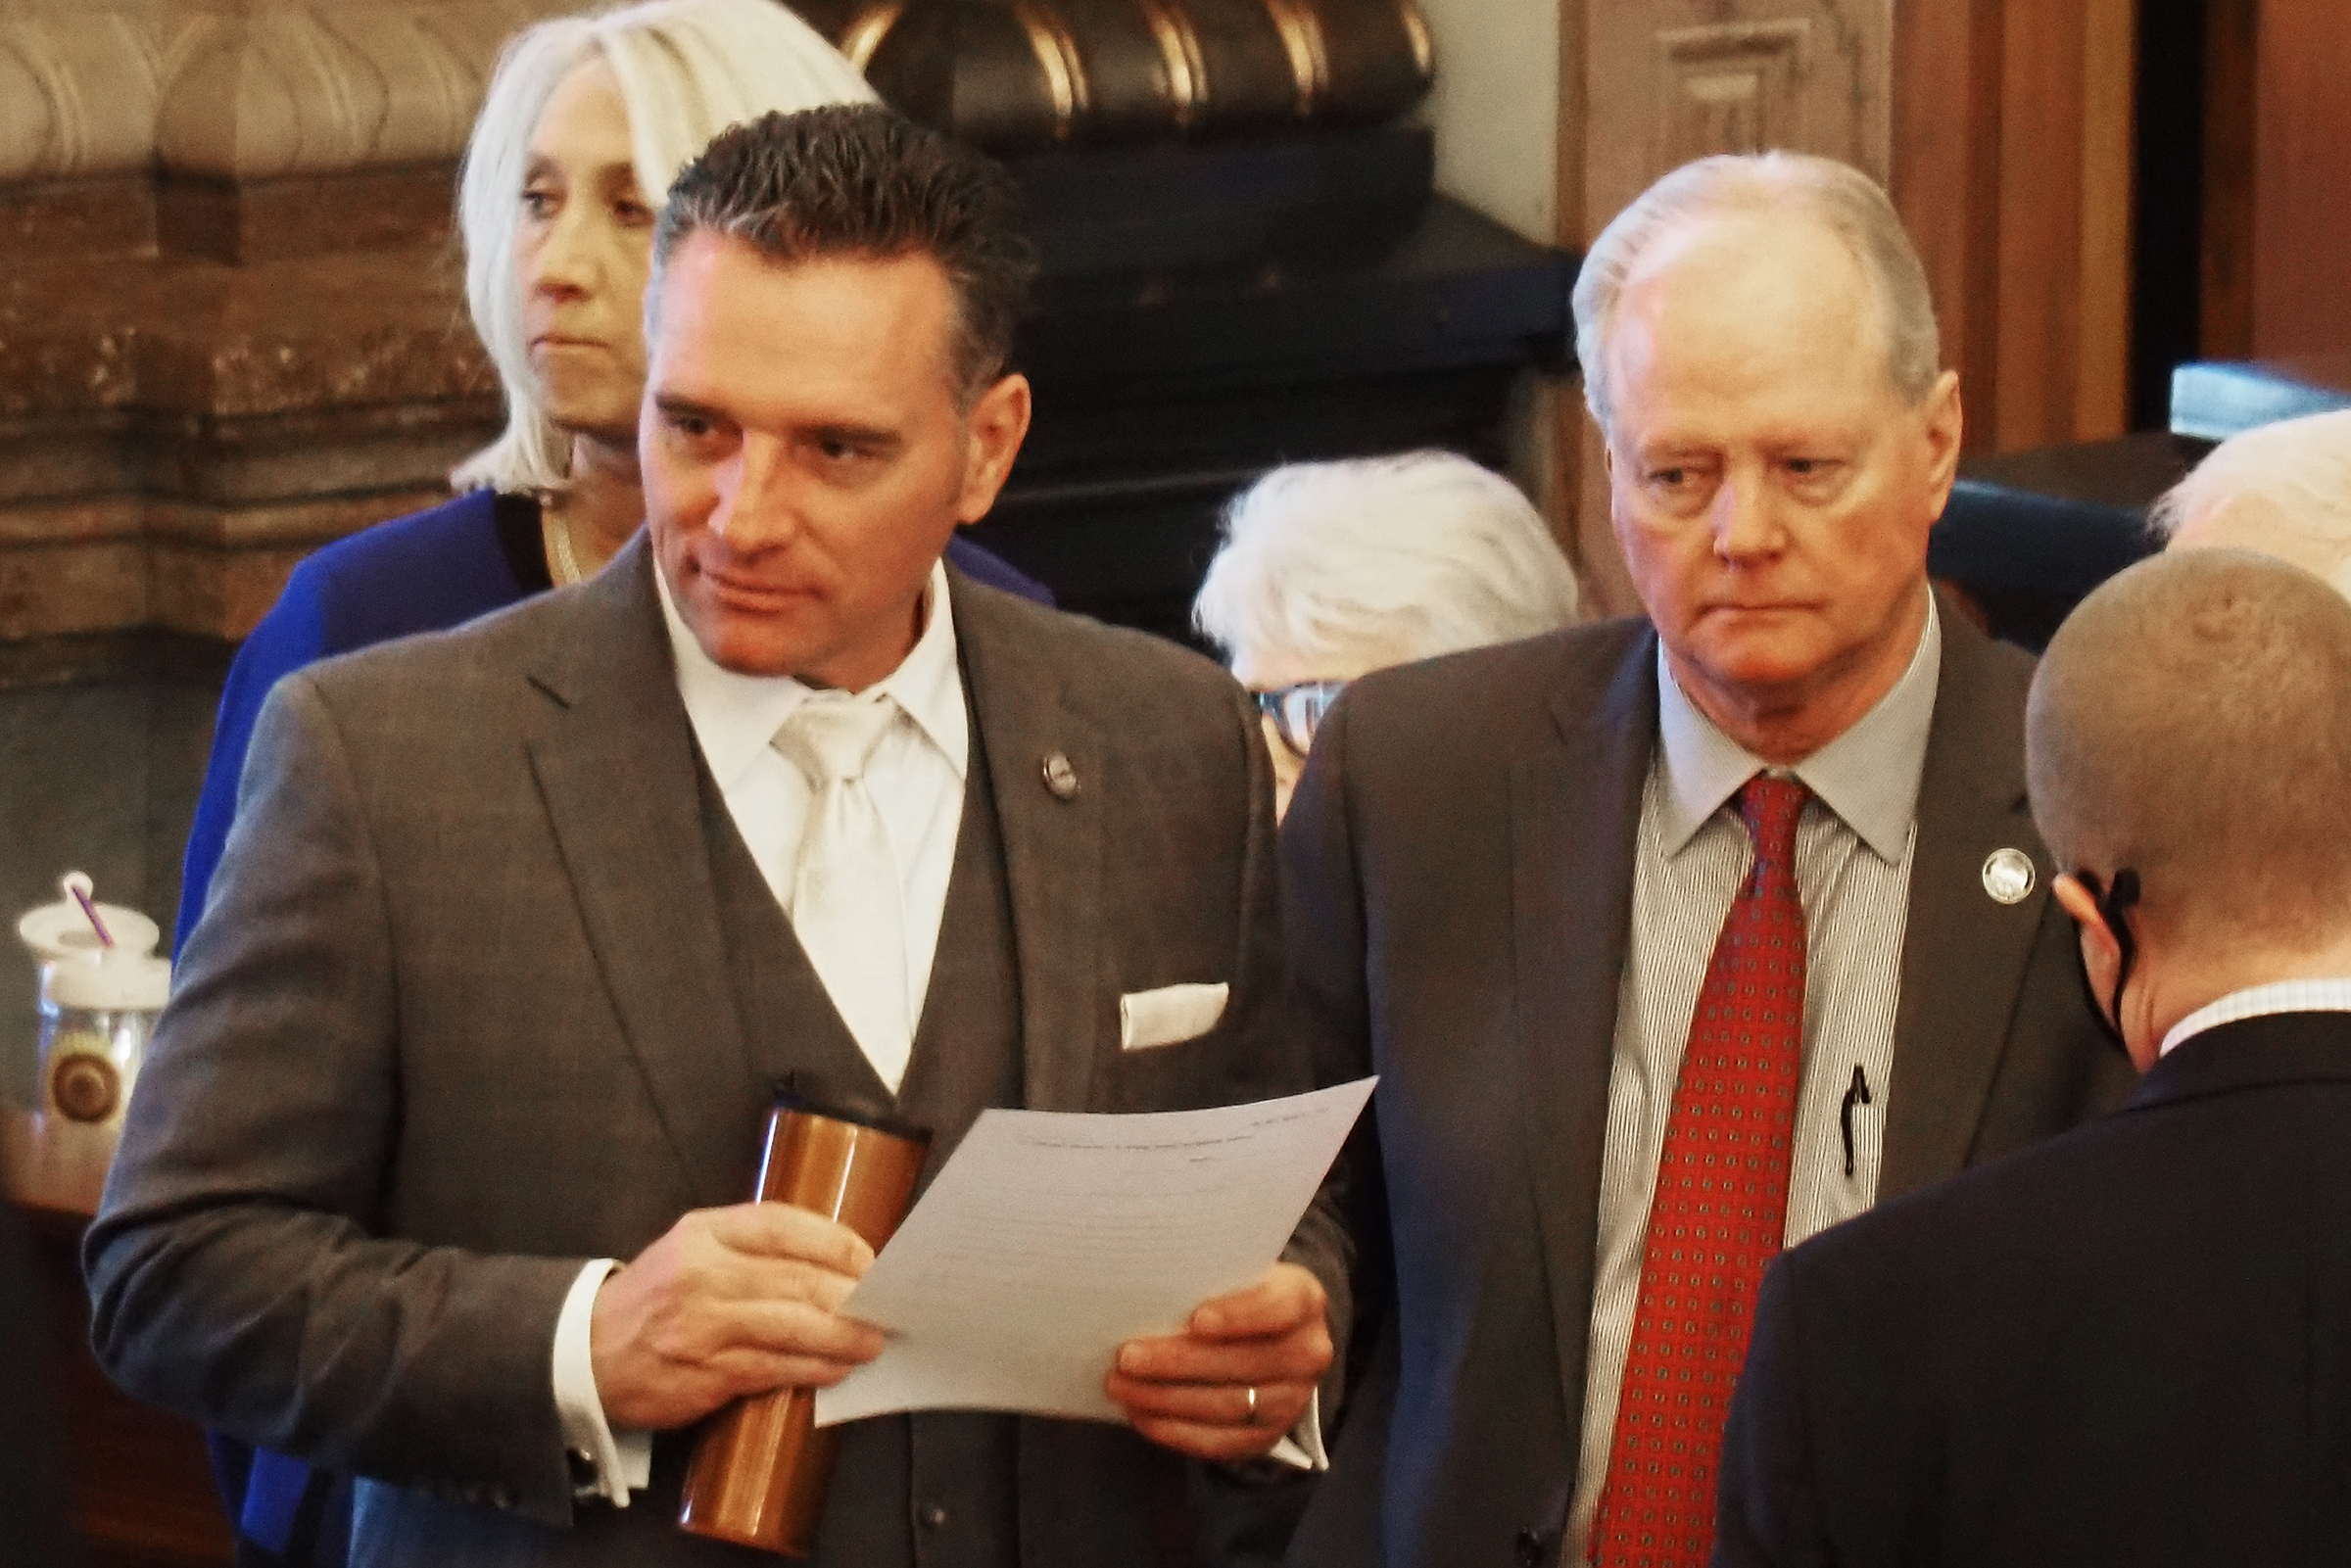 Kansas Senate majority leader had 0.17 blood alcohol level in wrong-way pursuit